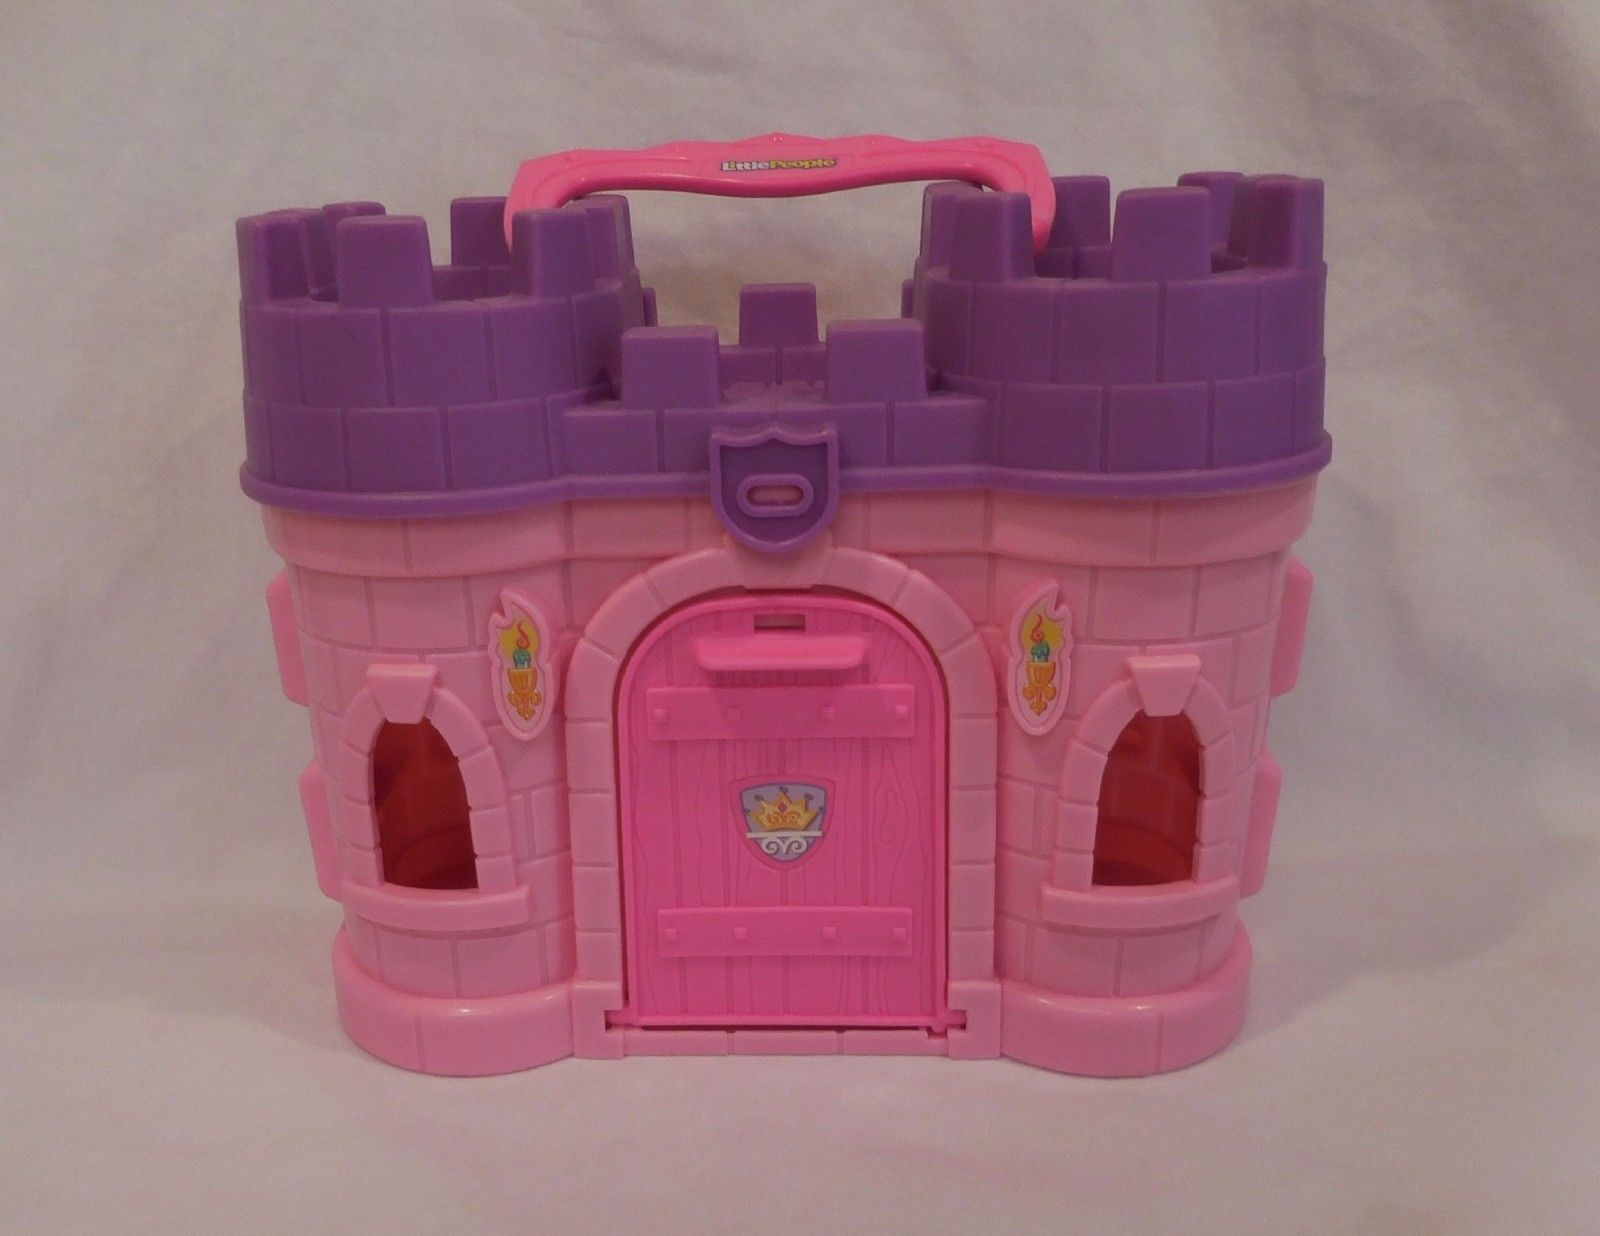 little people princess castle - HD1600×1236